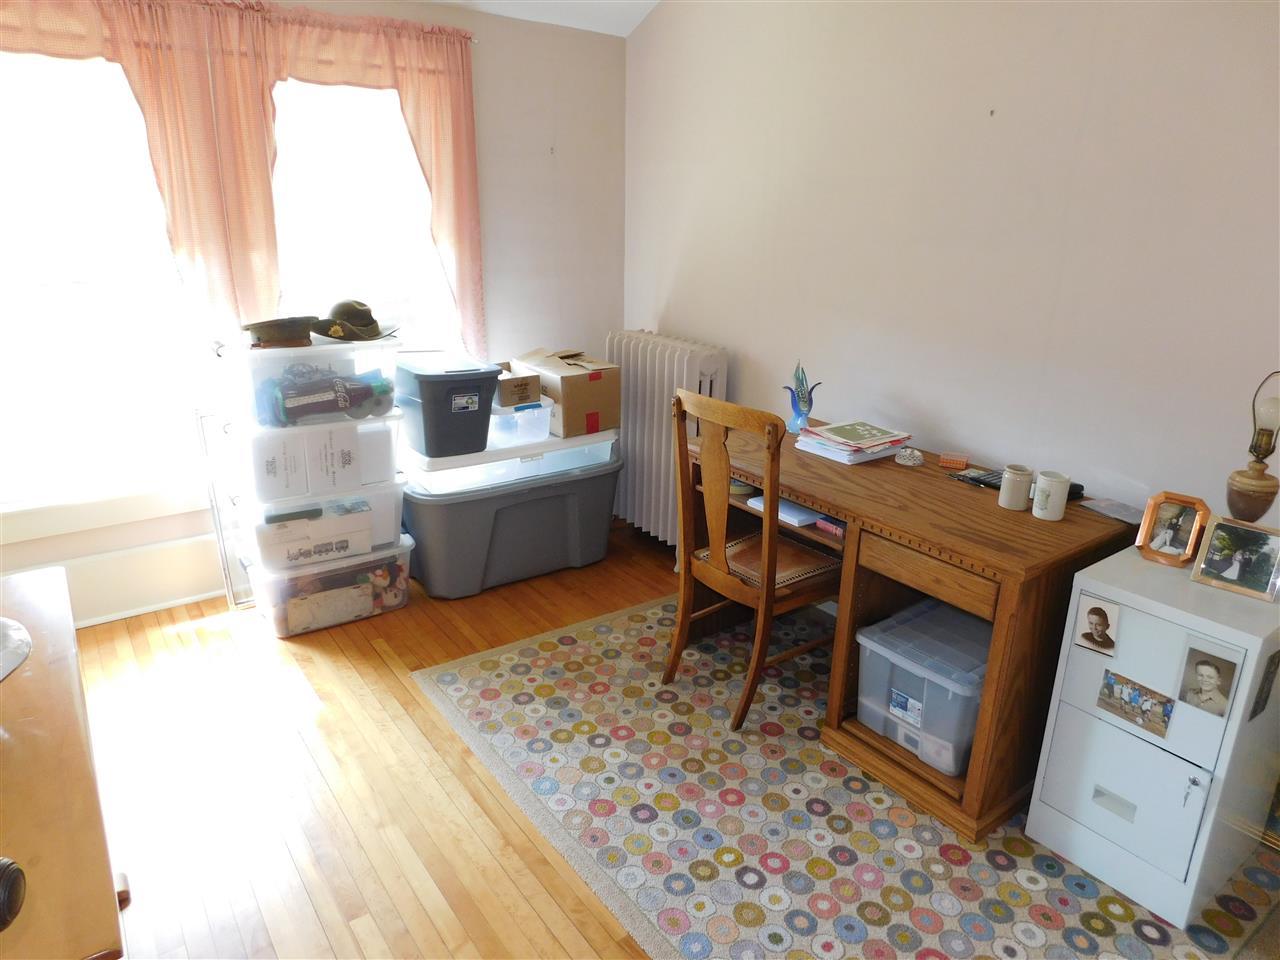 3rd Bedroom/Office (12 x 10) Closet, & Hardwood Floors! 12114511